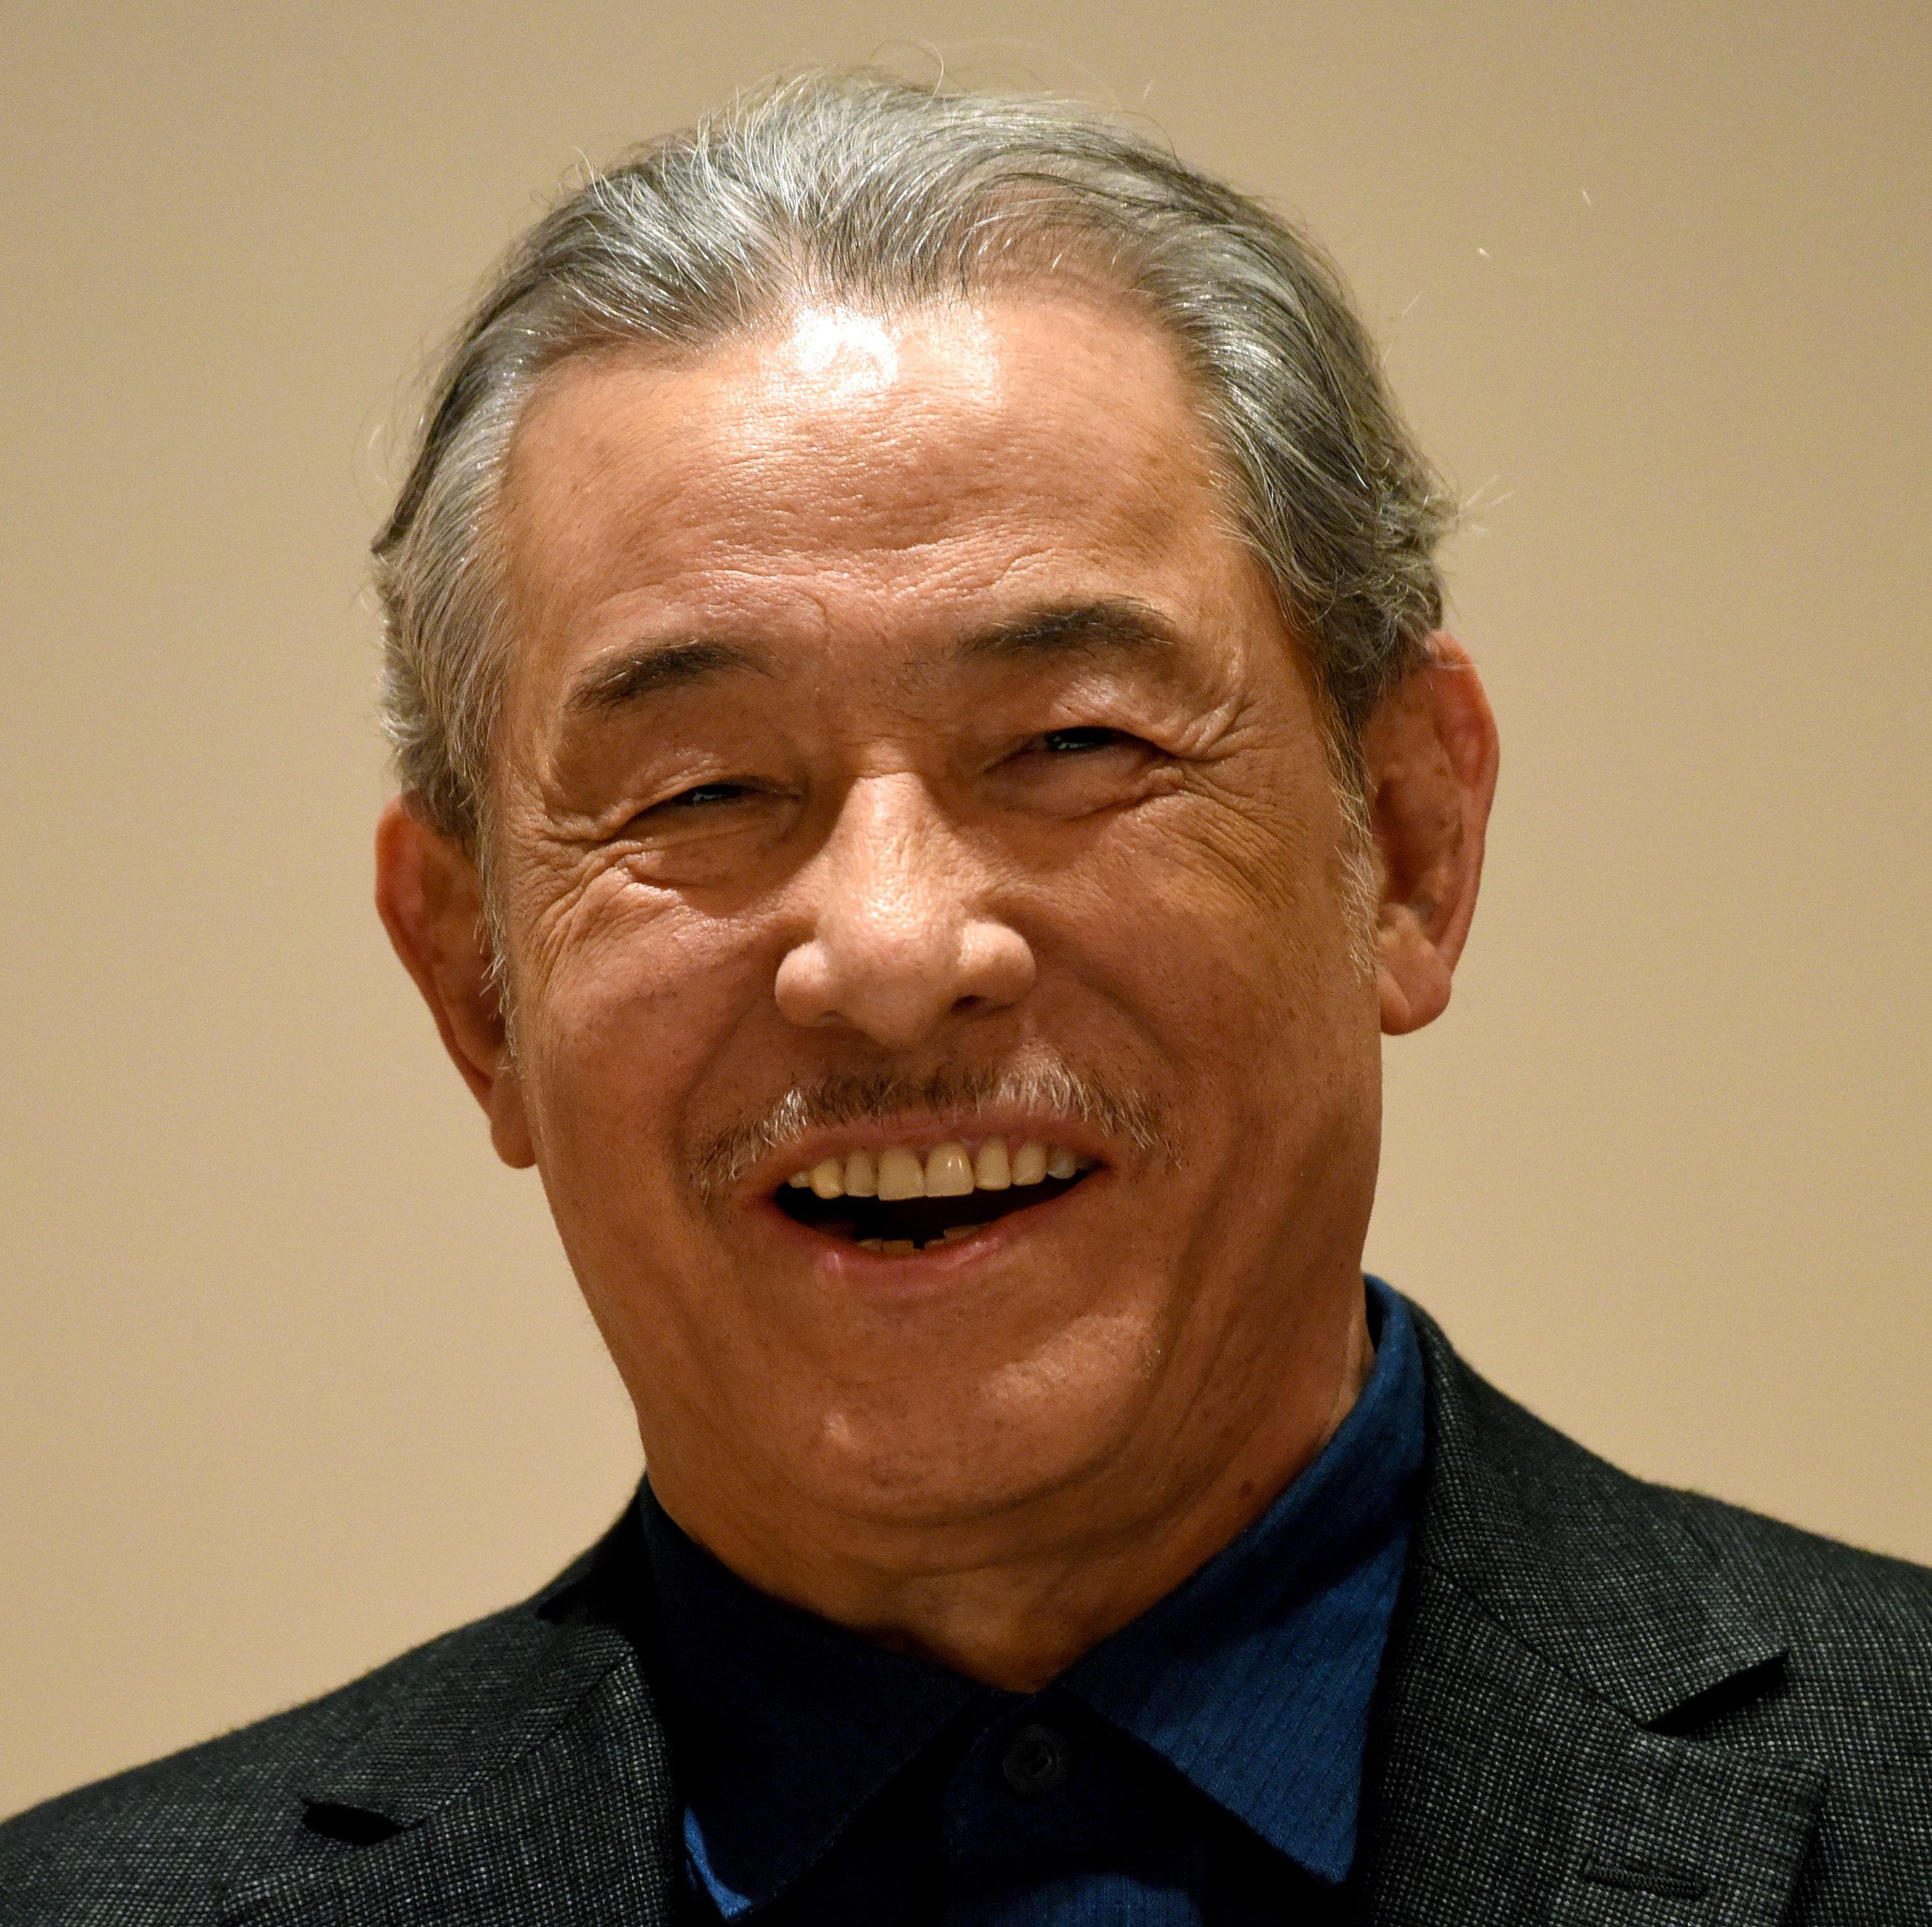 Japanese designer Issey Miyake retired the Jobs black turtleneck after Jobs died.